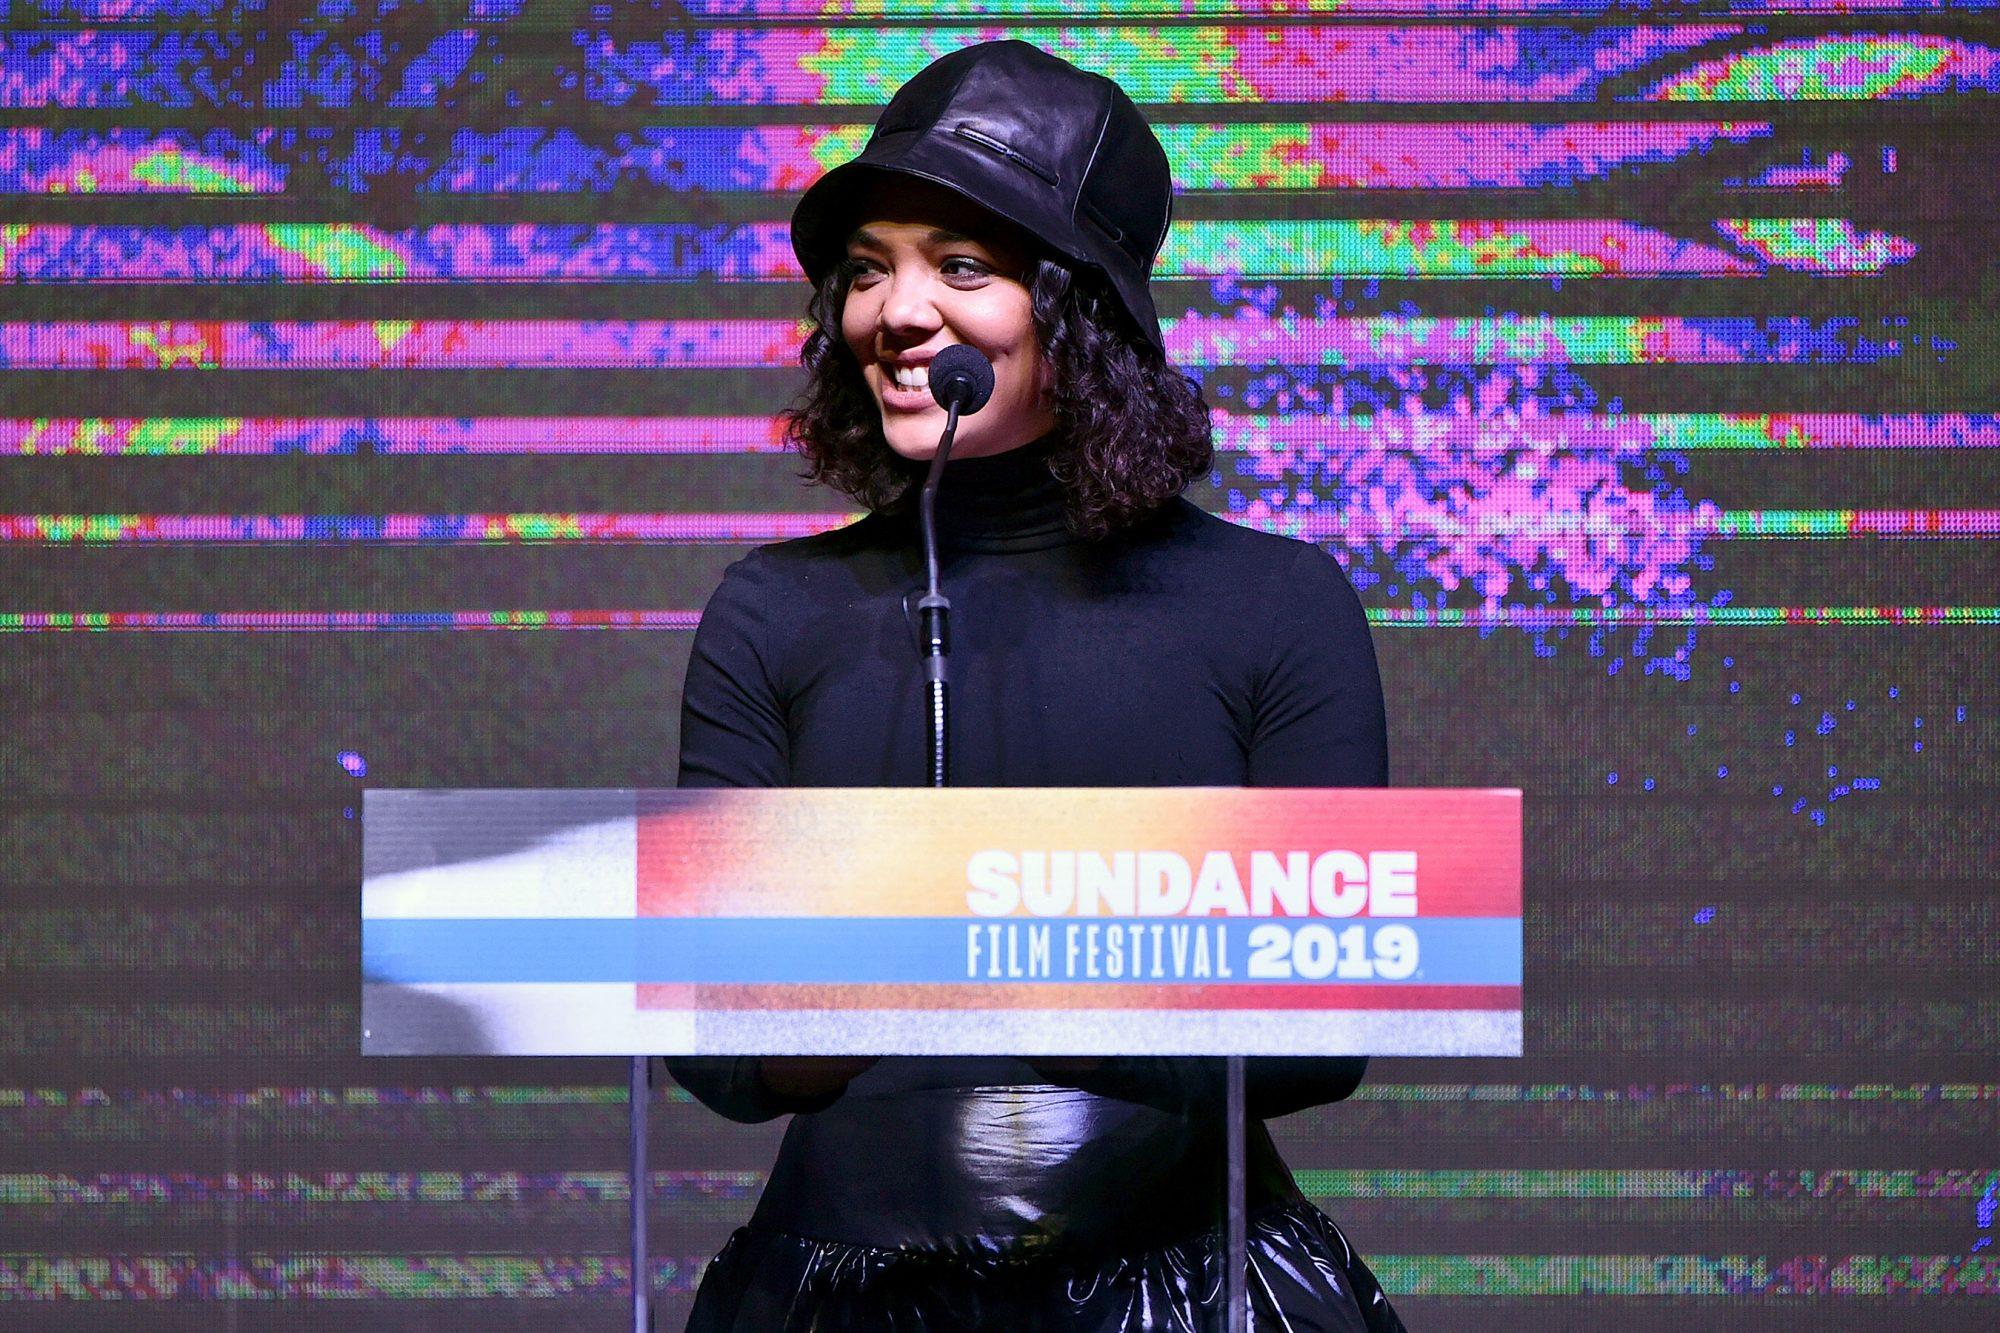 2019 Sundance Film Festival - Awards Night Ceremony